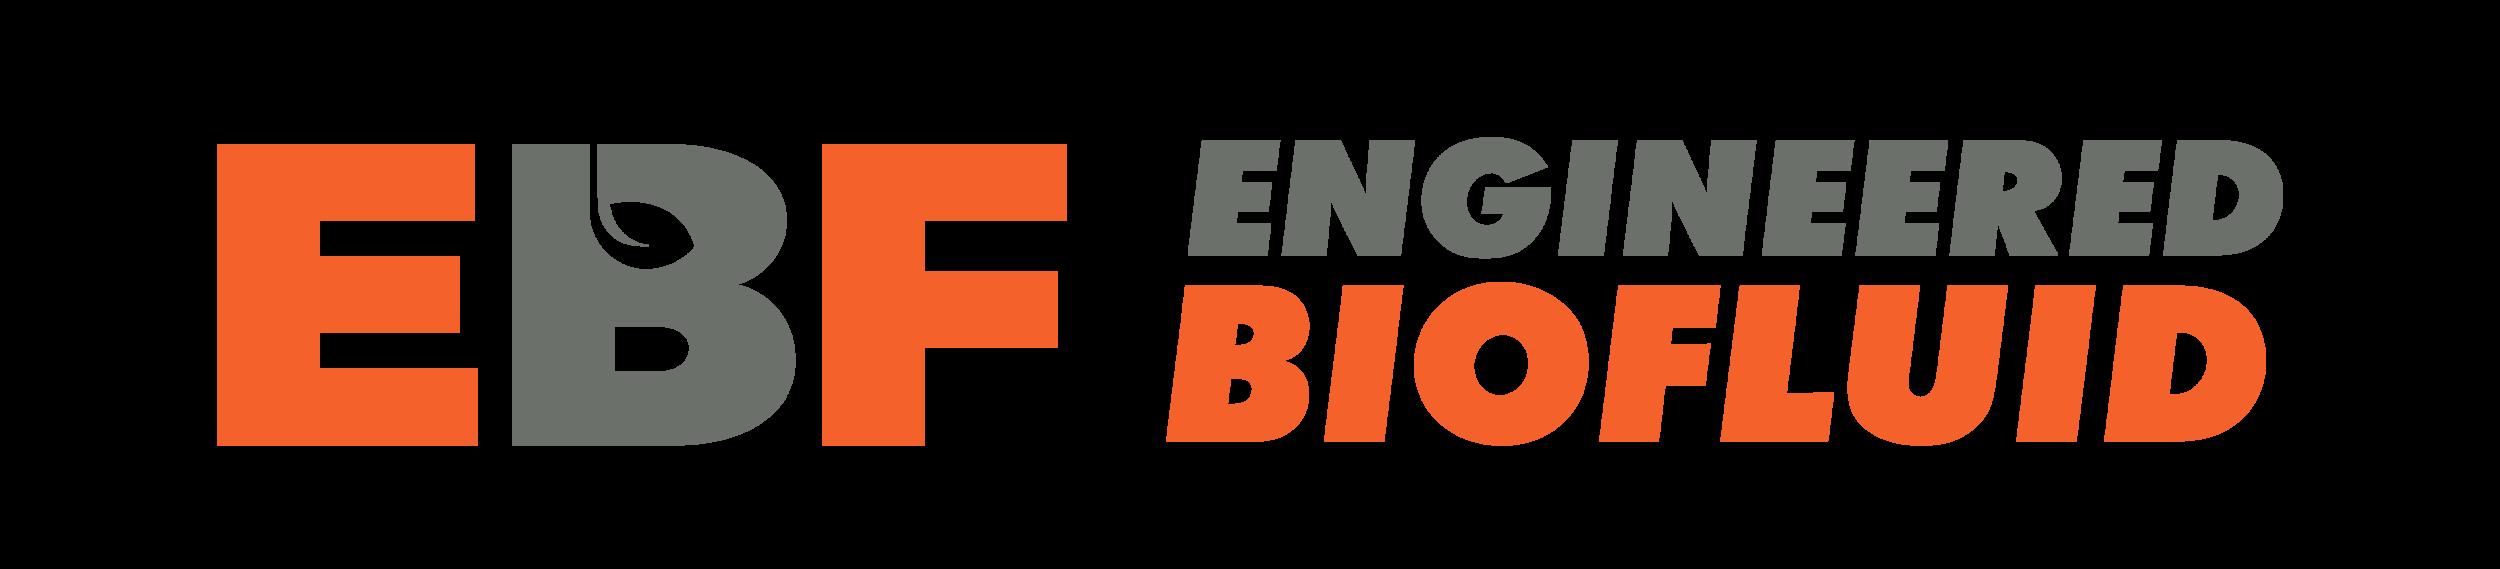 EBF-Logo-Concept-FINAL_Logo 2 - Dark BG copy 10.png